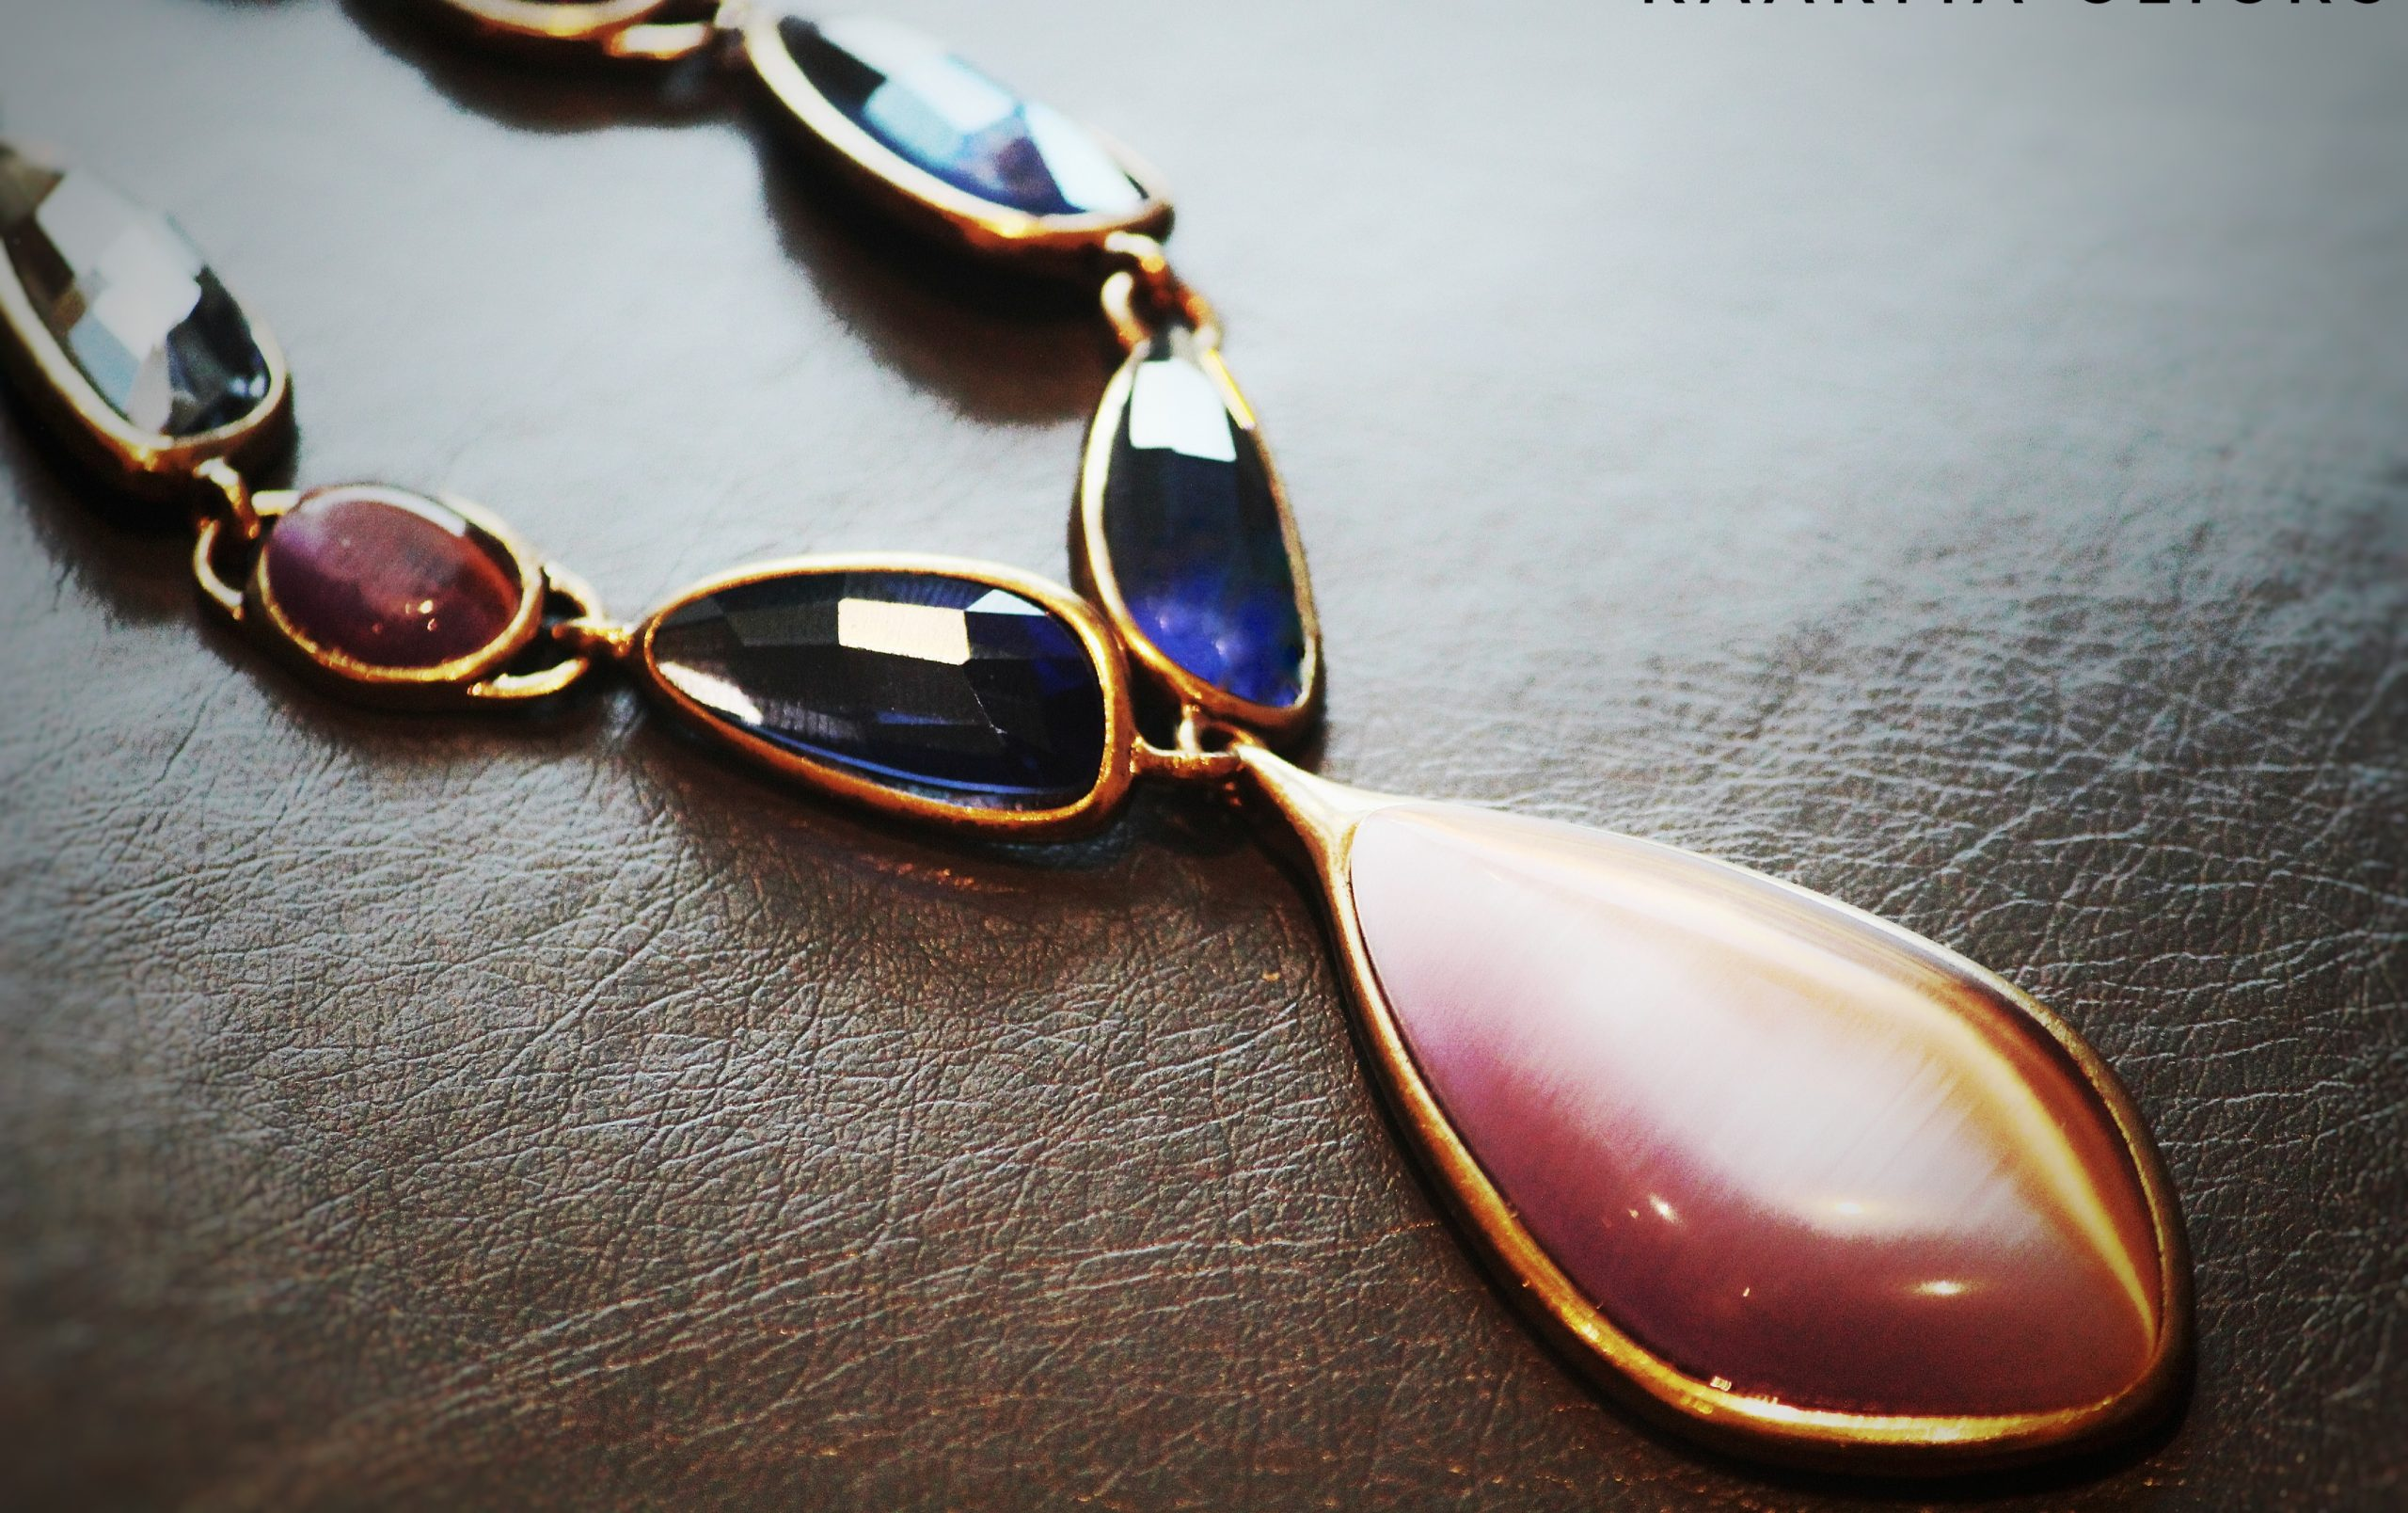 Gem stones of a necklace